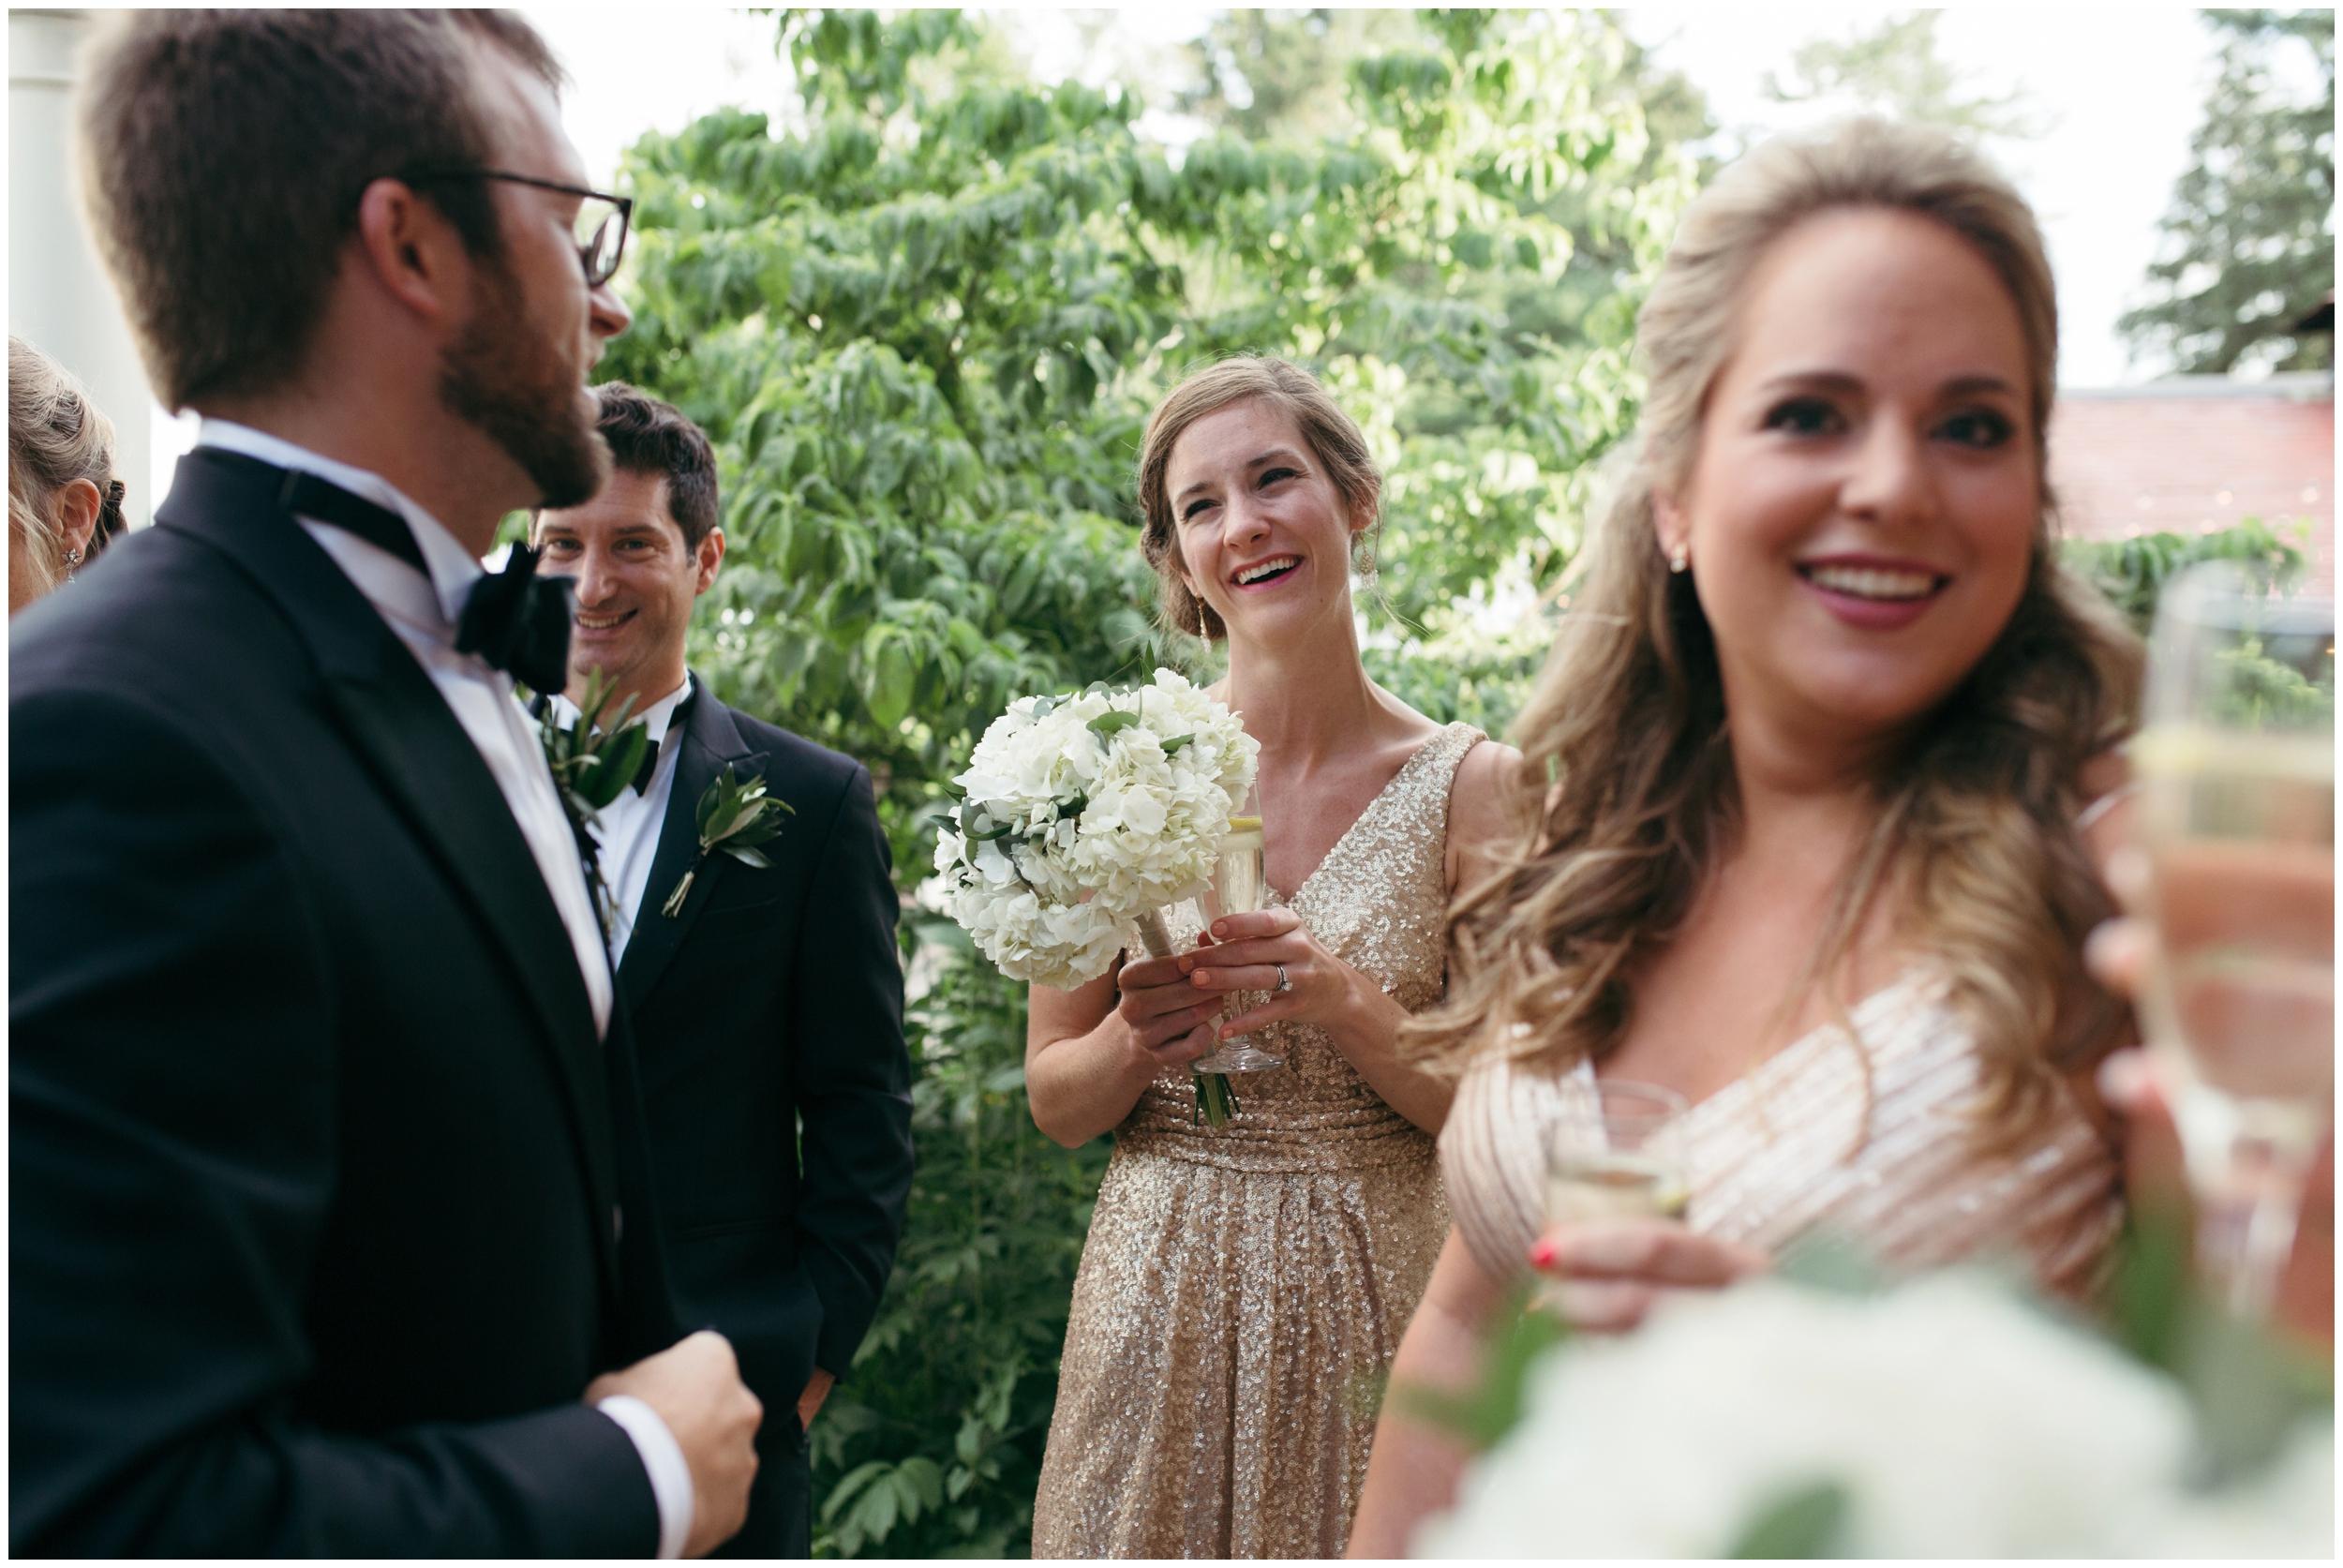 Willowdale-Estate-Wedding-Bailey-Q-Photo-Boston-Wedding-Photographer-051.JPG